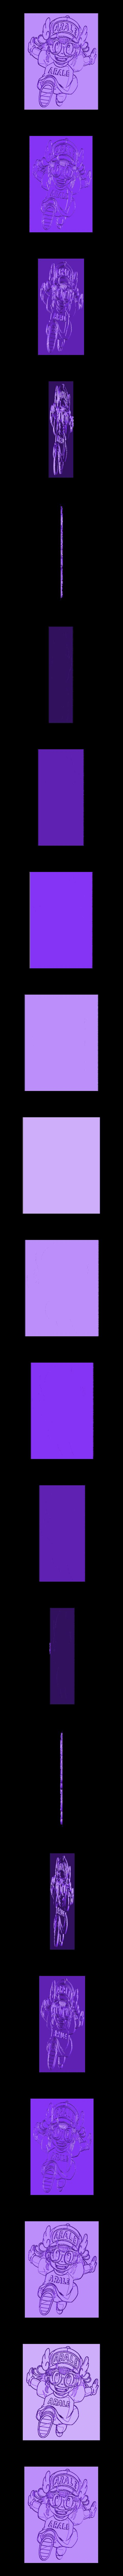 arale_lithophane.stl Download free STL file Arali lithophane • Design to 3D print, 3dlito